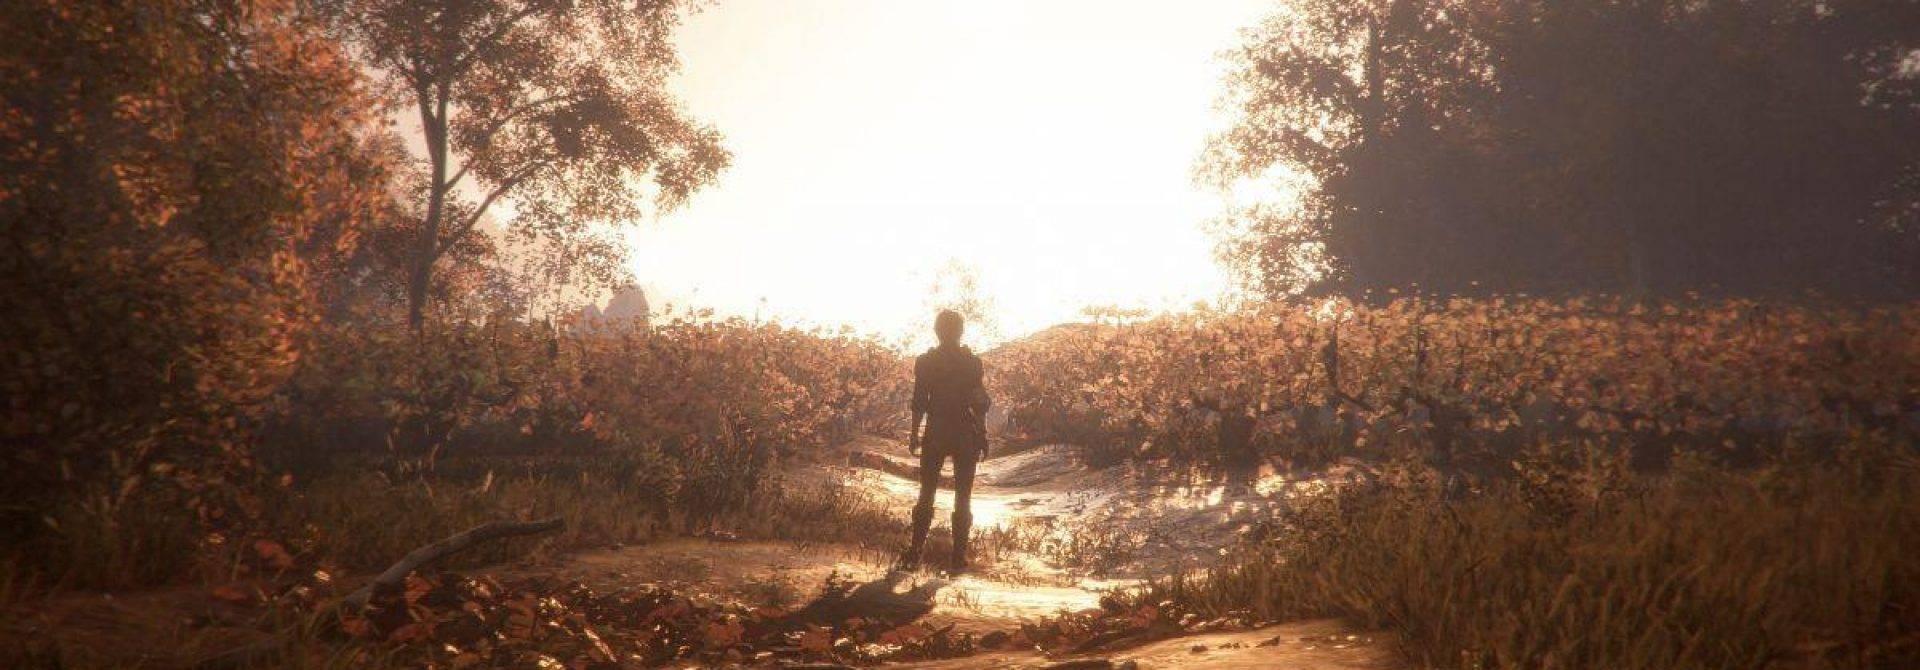 A Plague Tale: Innocence — New Story Trailer